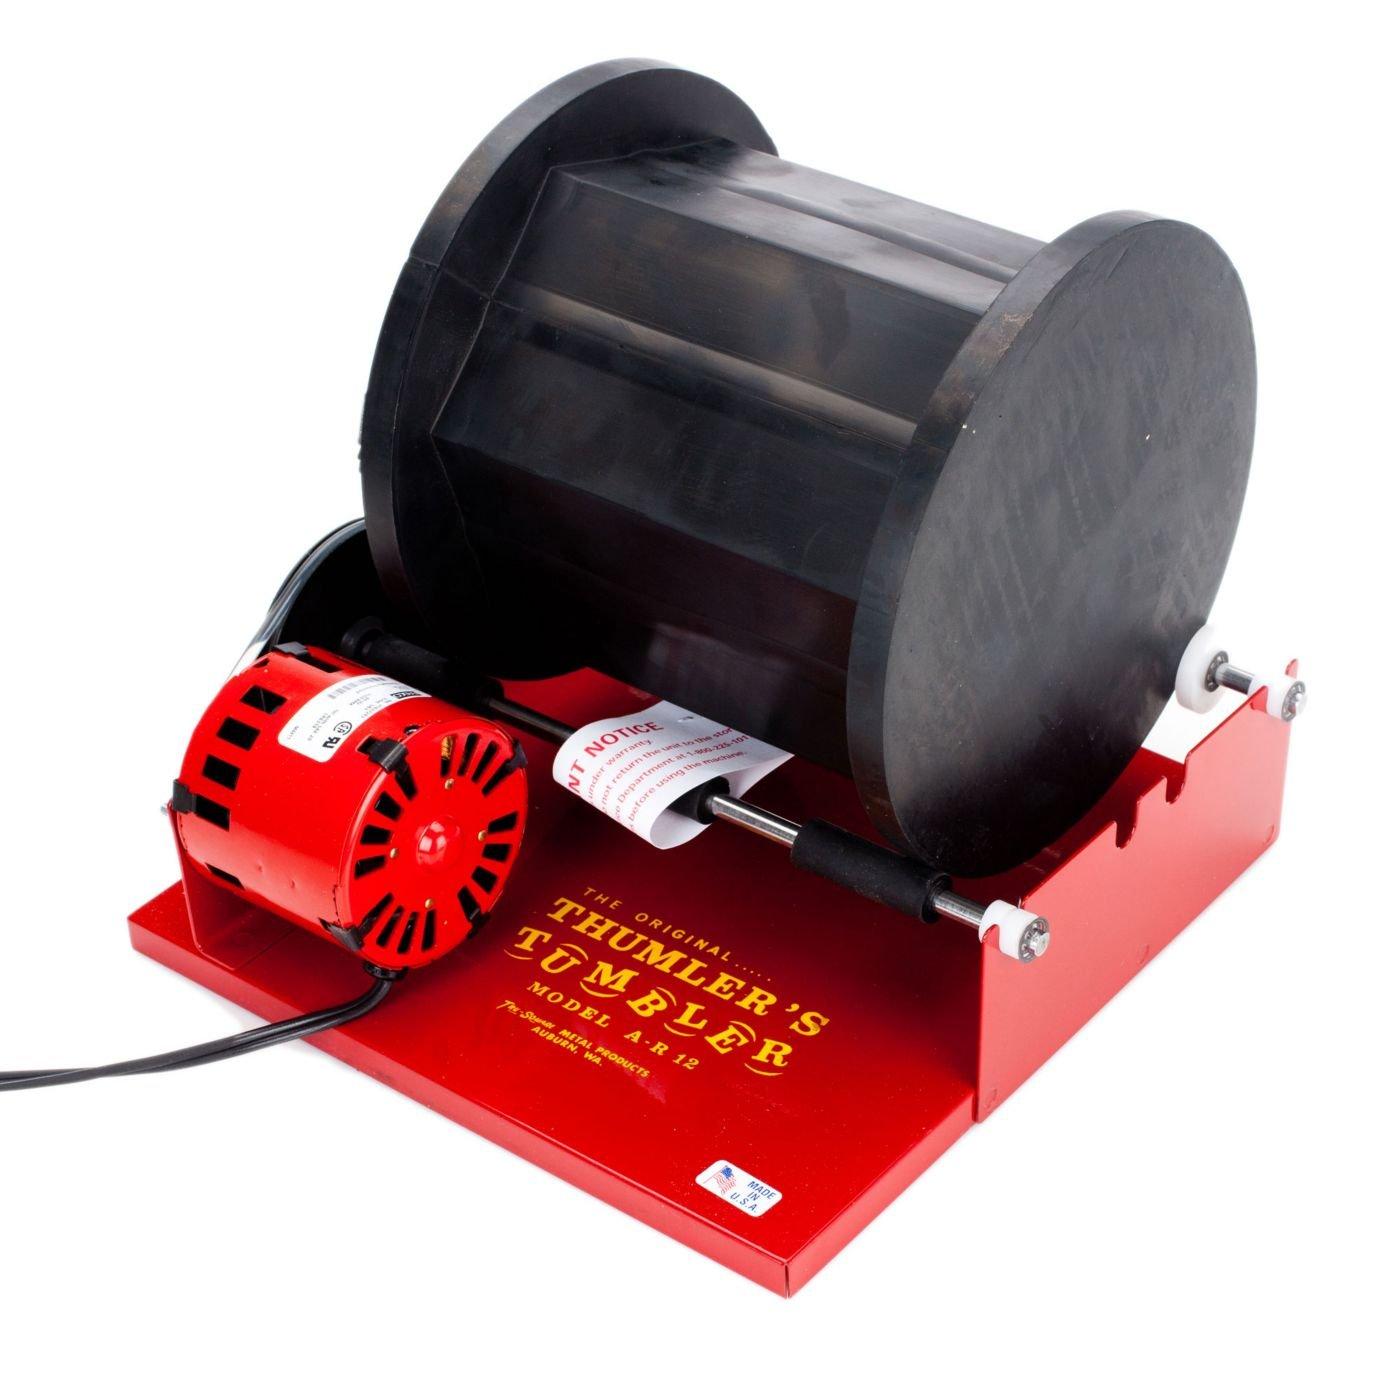 Tru-square Metal Products Model A-R12 Rock Tumbler 130